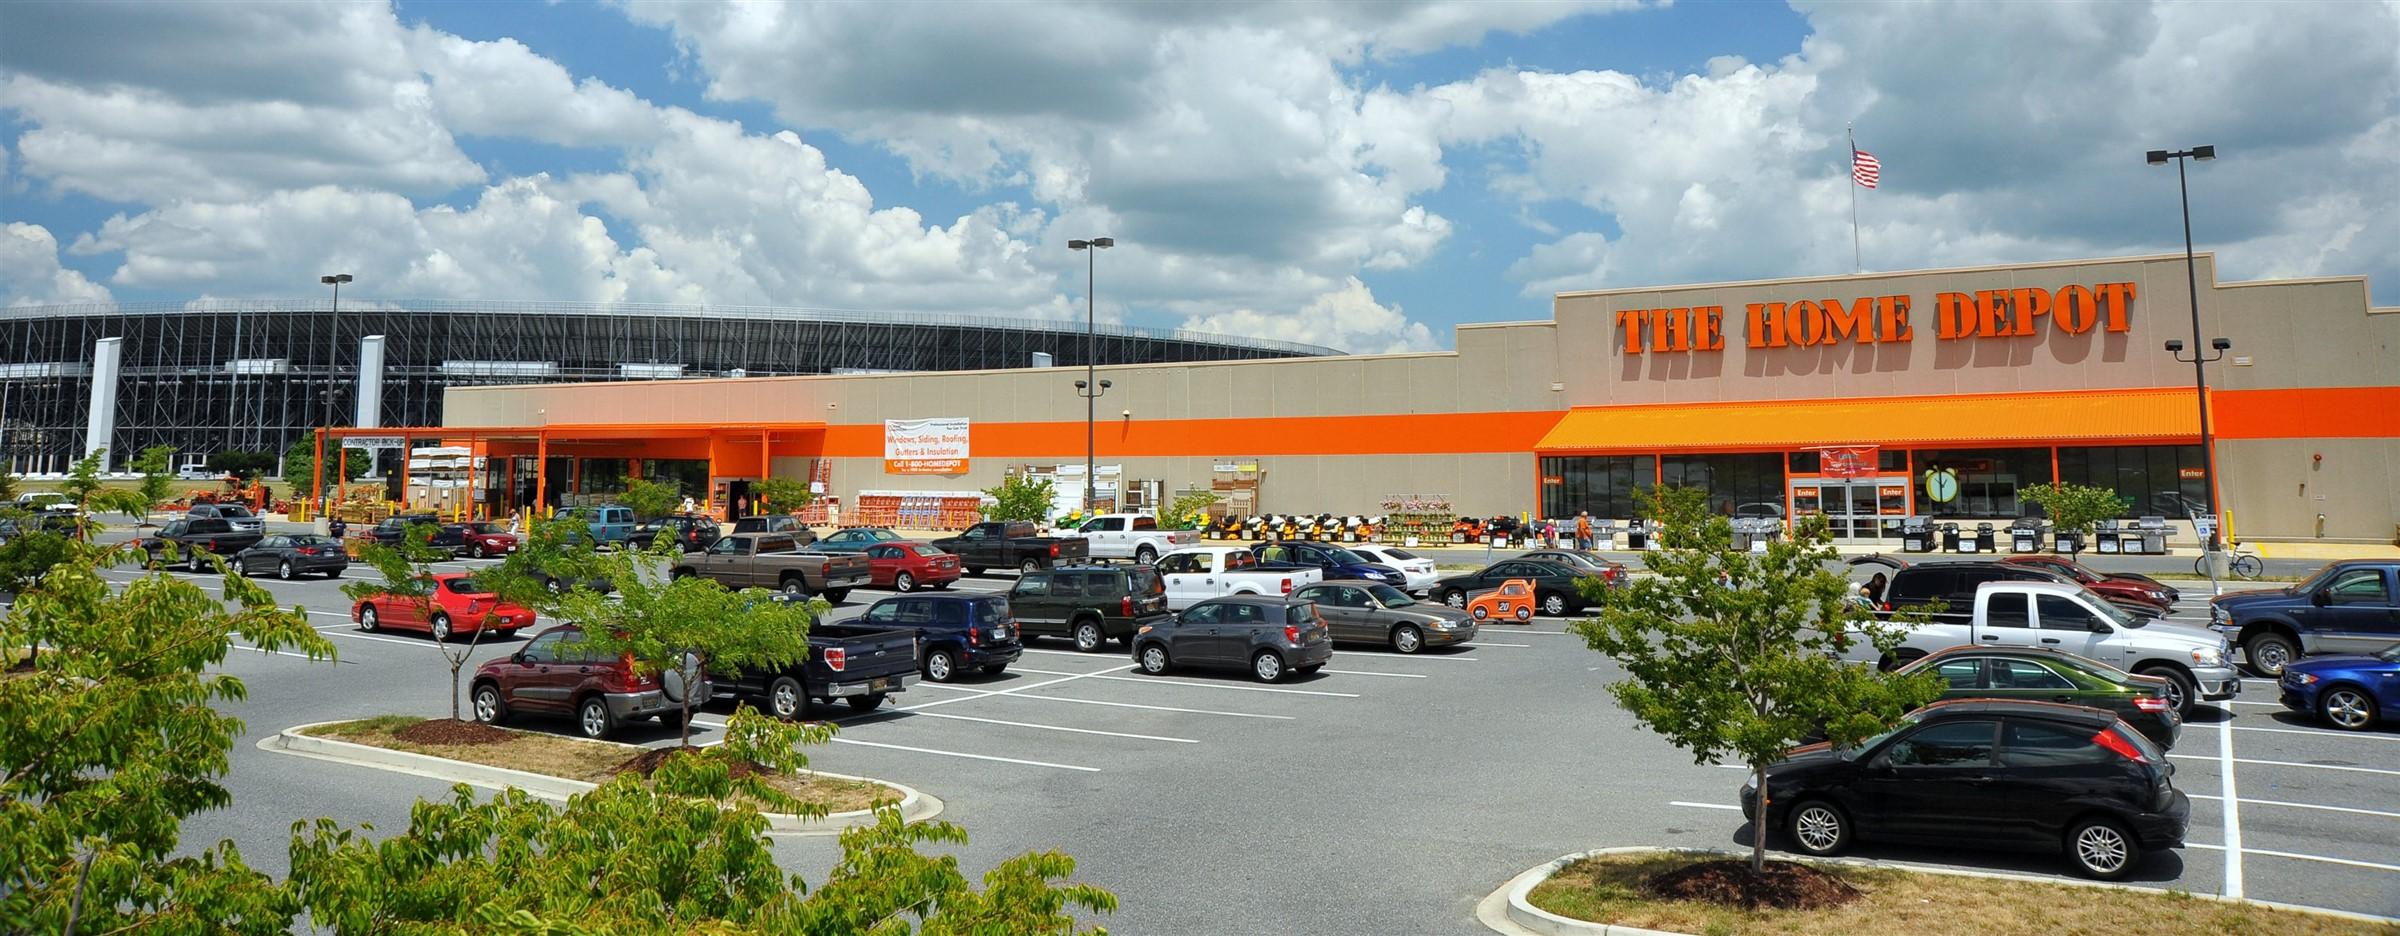 Home Depot Dover De Commercial Real Estate Development Brokerage